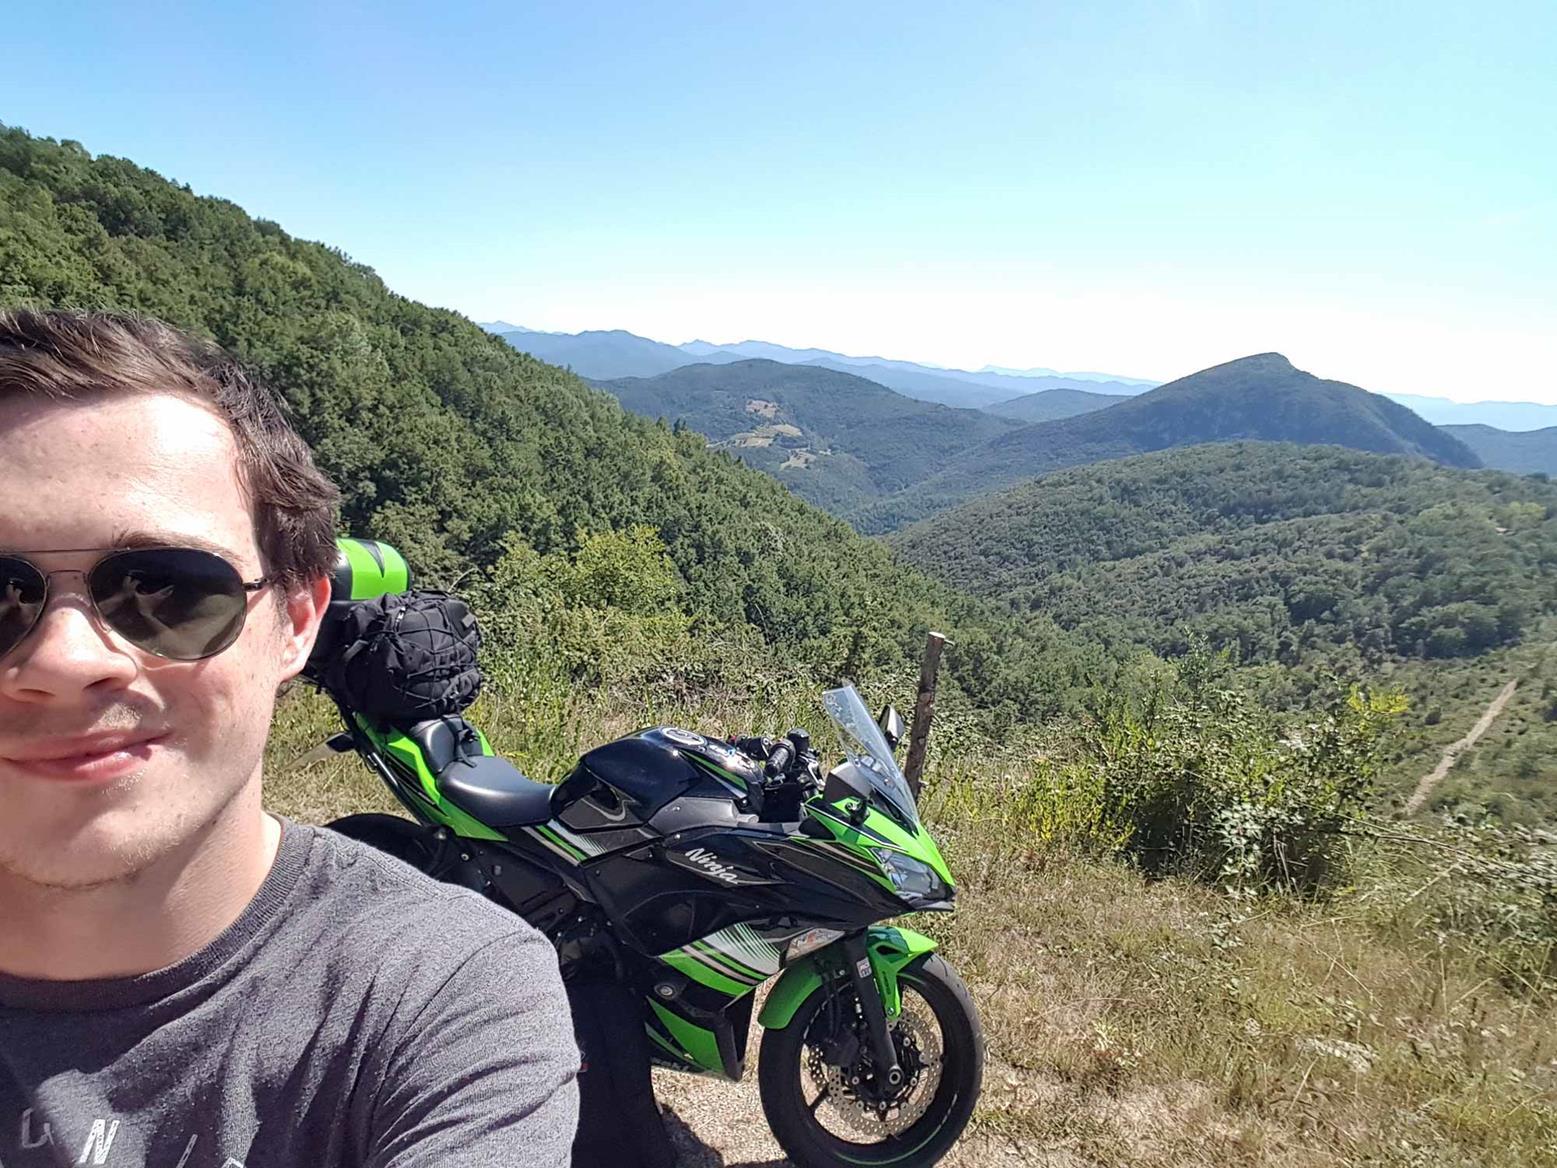 James Read bags a selfie with his Kawasaki Ninja 650